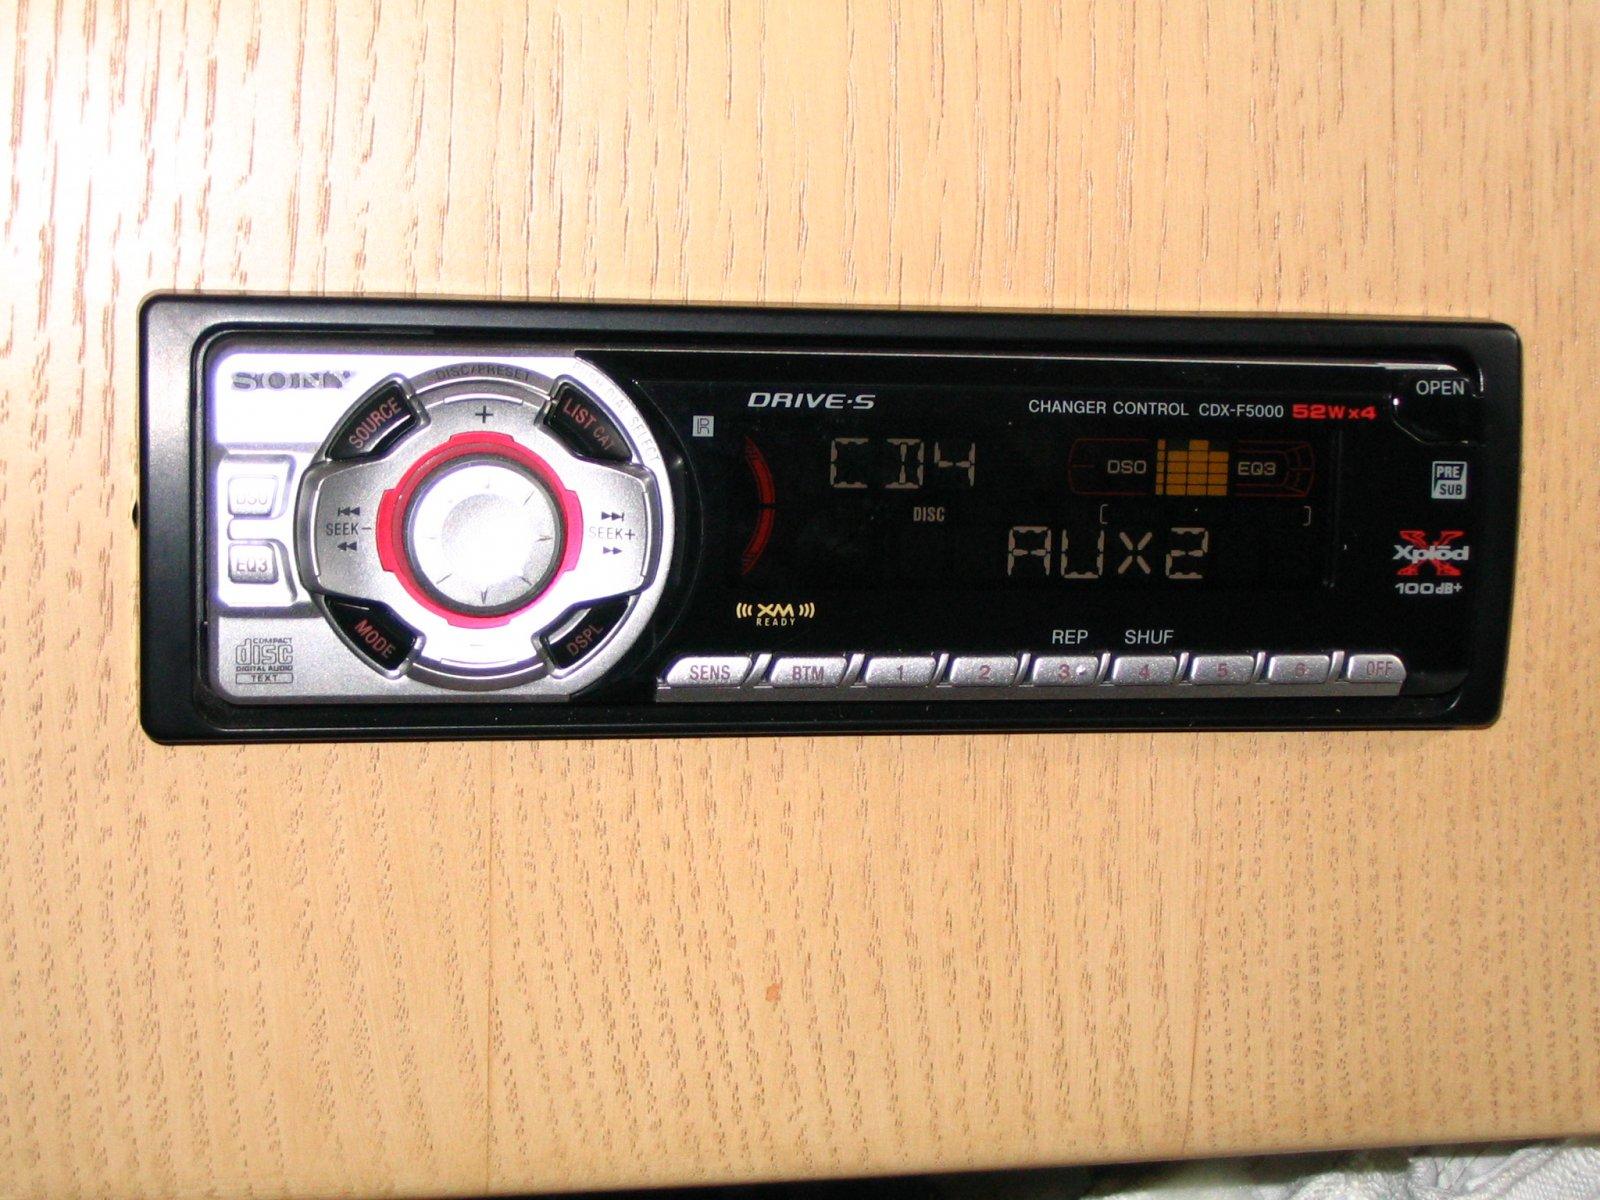 Sony Xplod Cdx F5000 Wiring Diagram